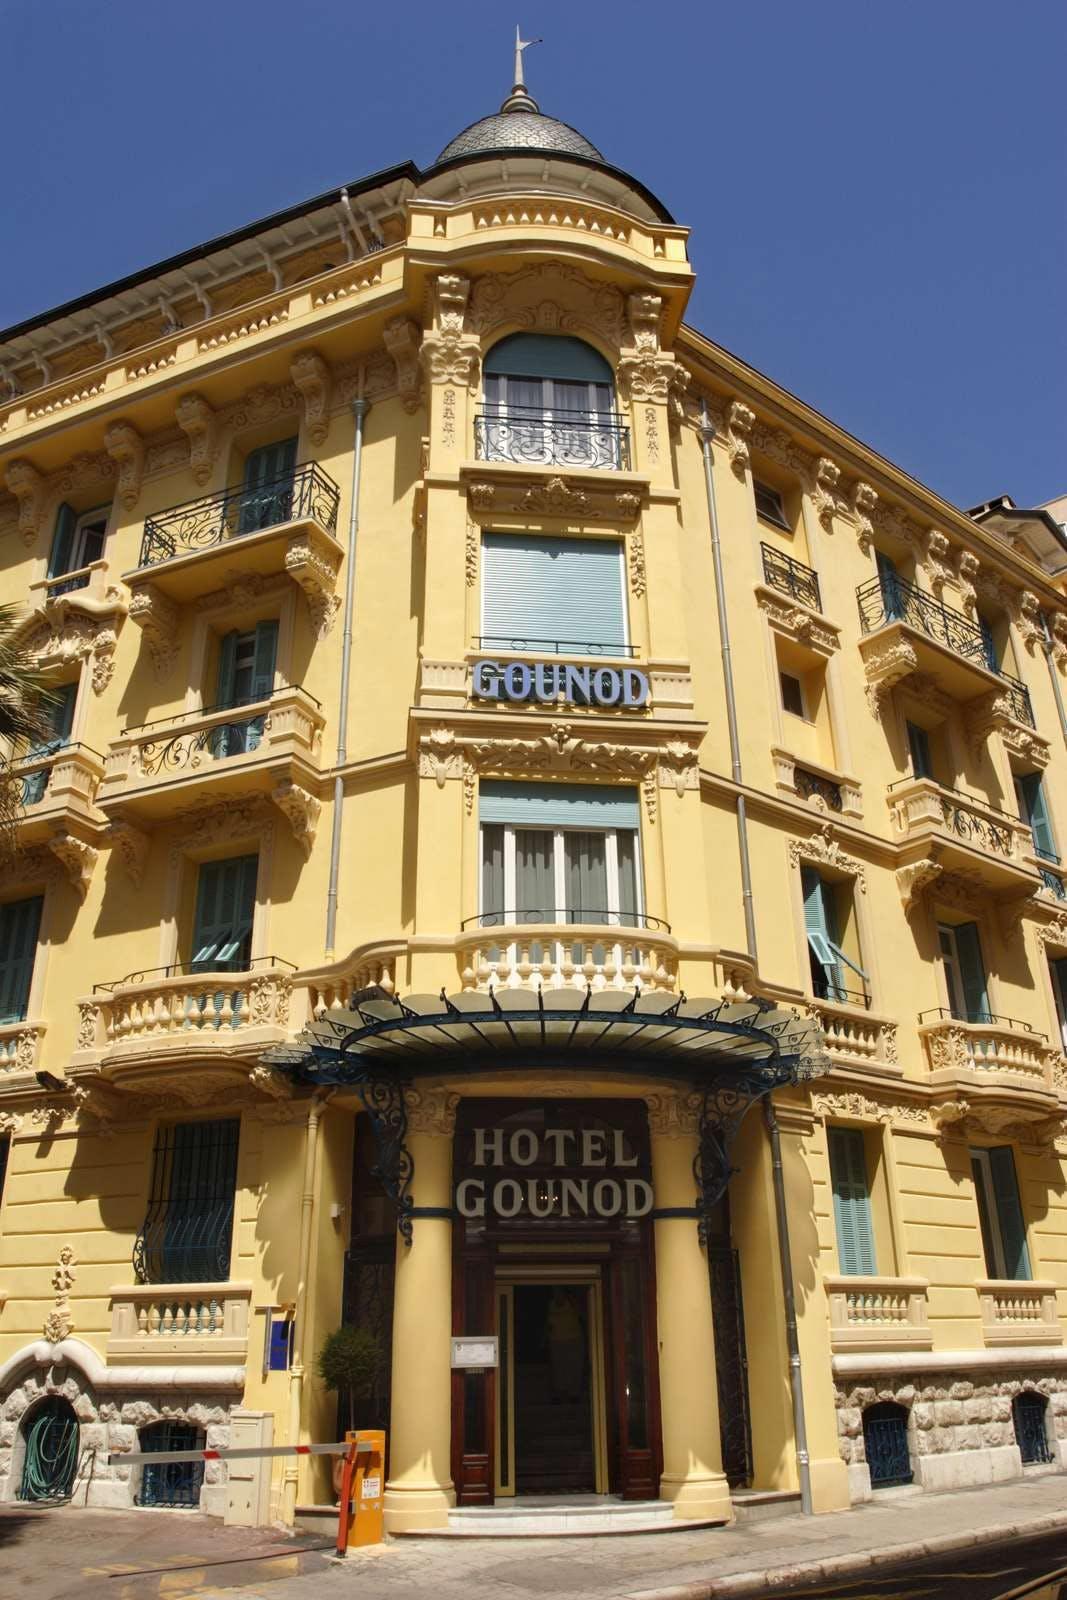 Hotel Gounod Nice